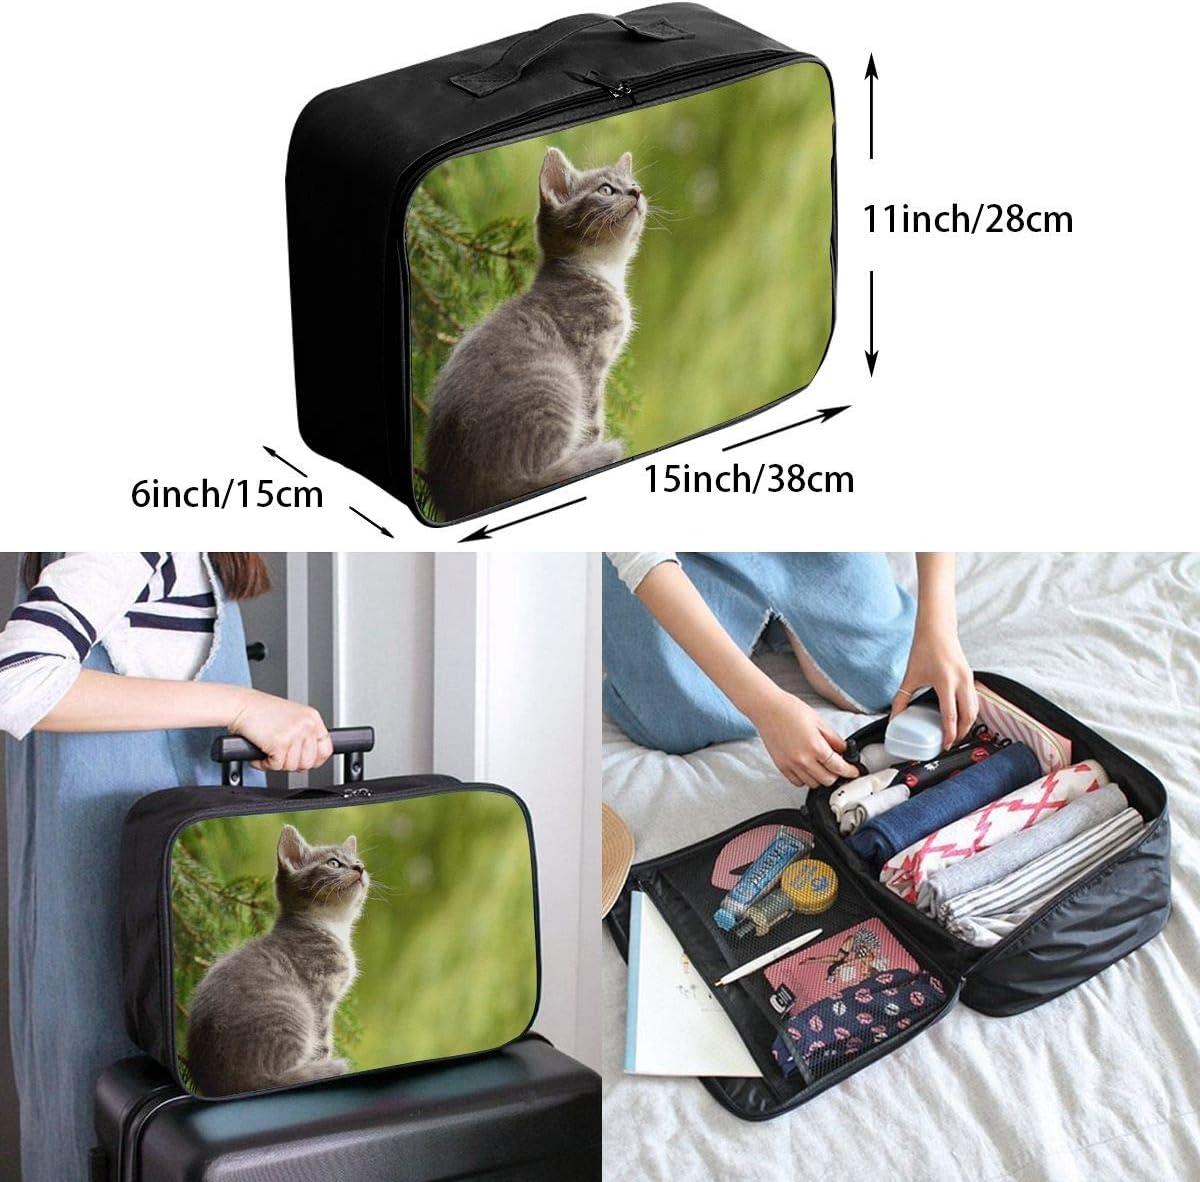 Kitten-cat Travel Carry-on Luggage Weekender Bag Overnight Tote Flight Duffel In Trolley Handle